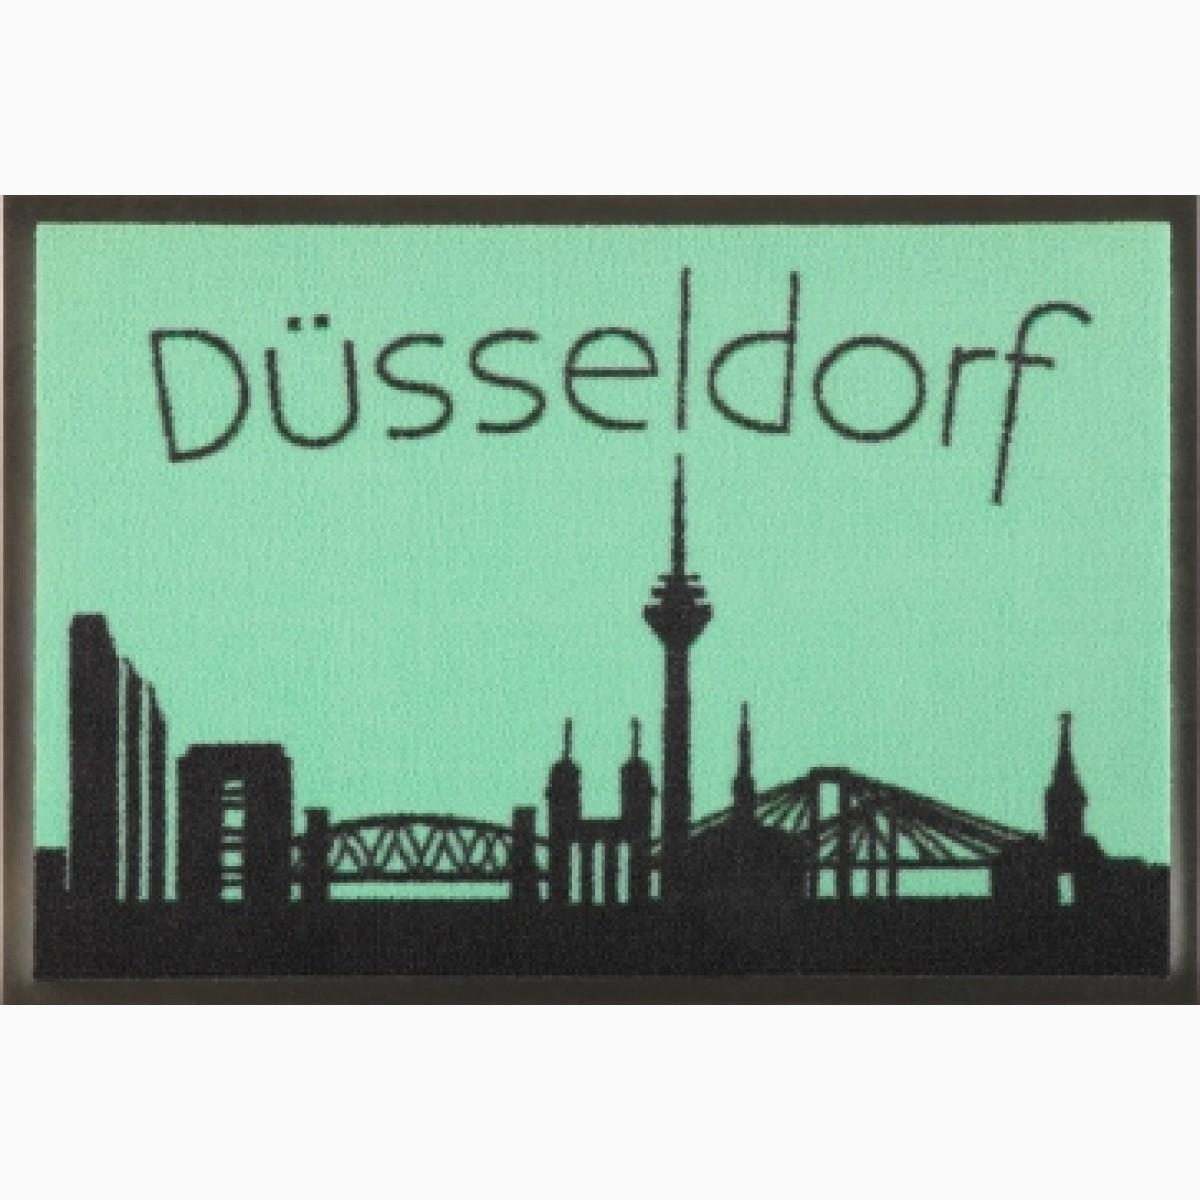 Fussmatte Düsseldorf